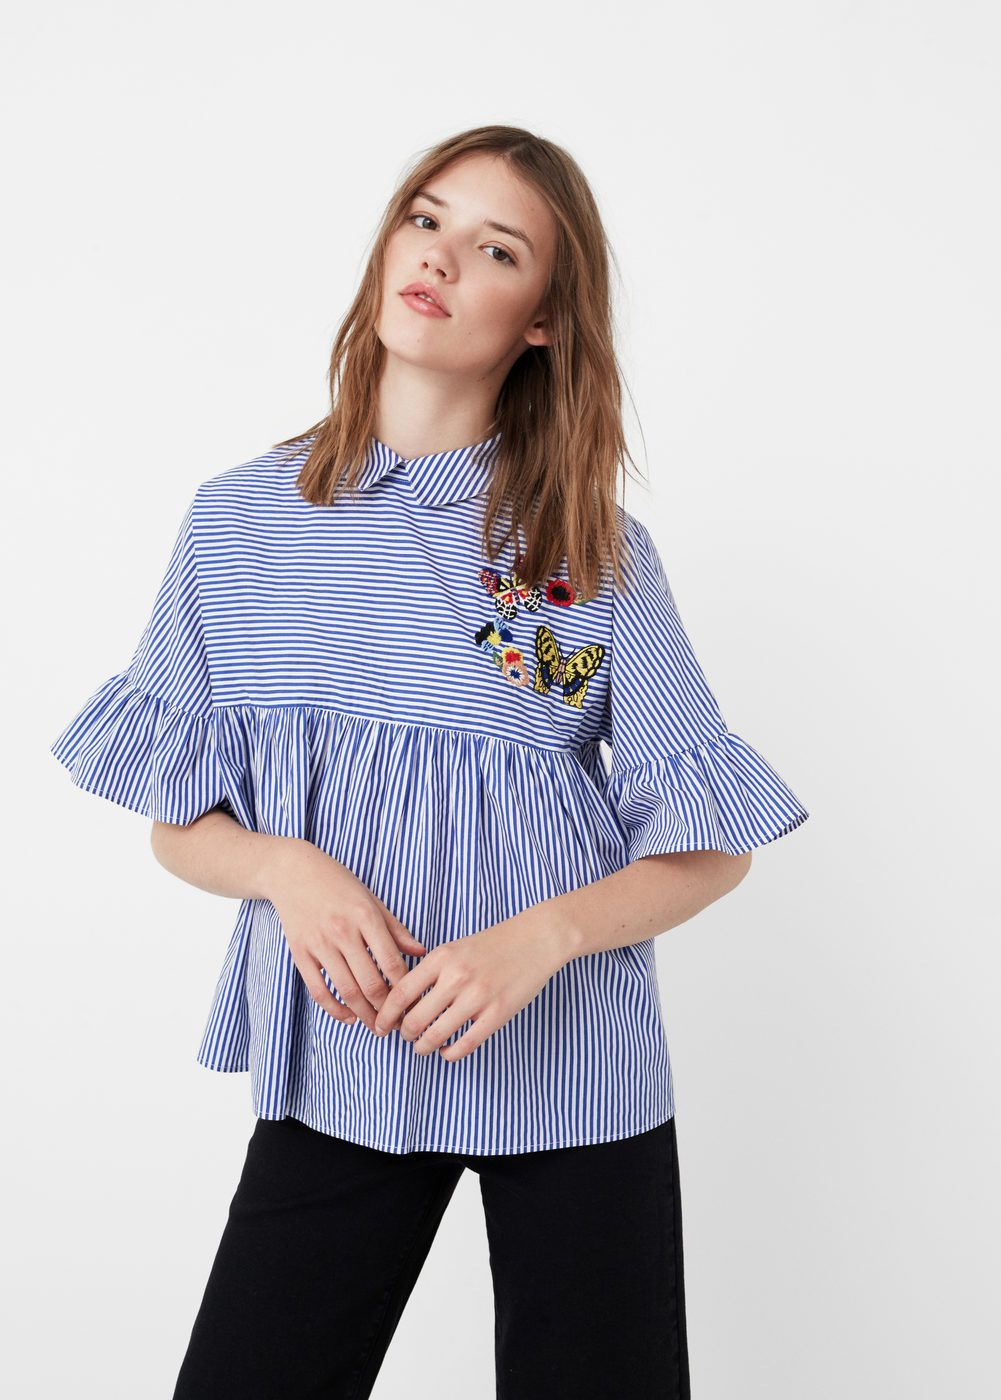 37542fff7 Blusa popeline riscas - Camisas de Mulher